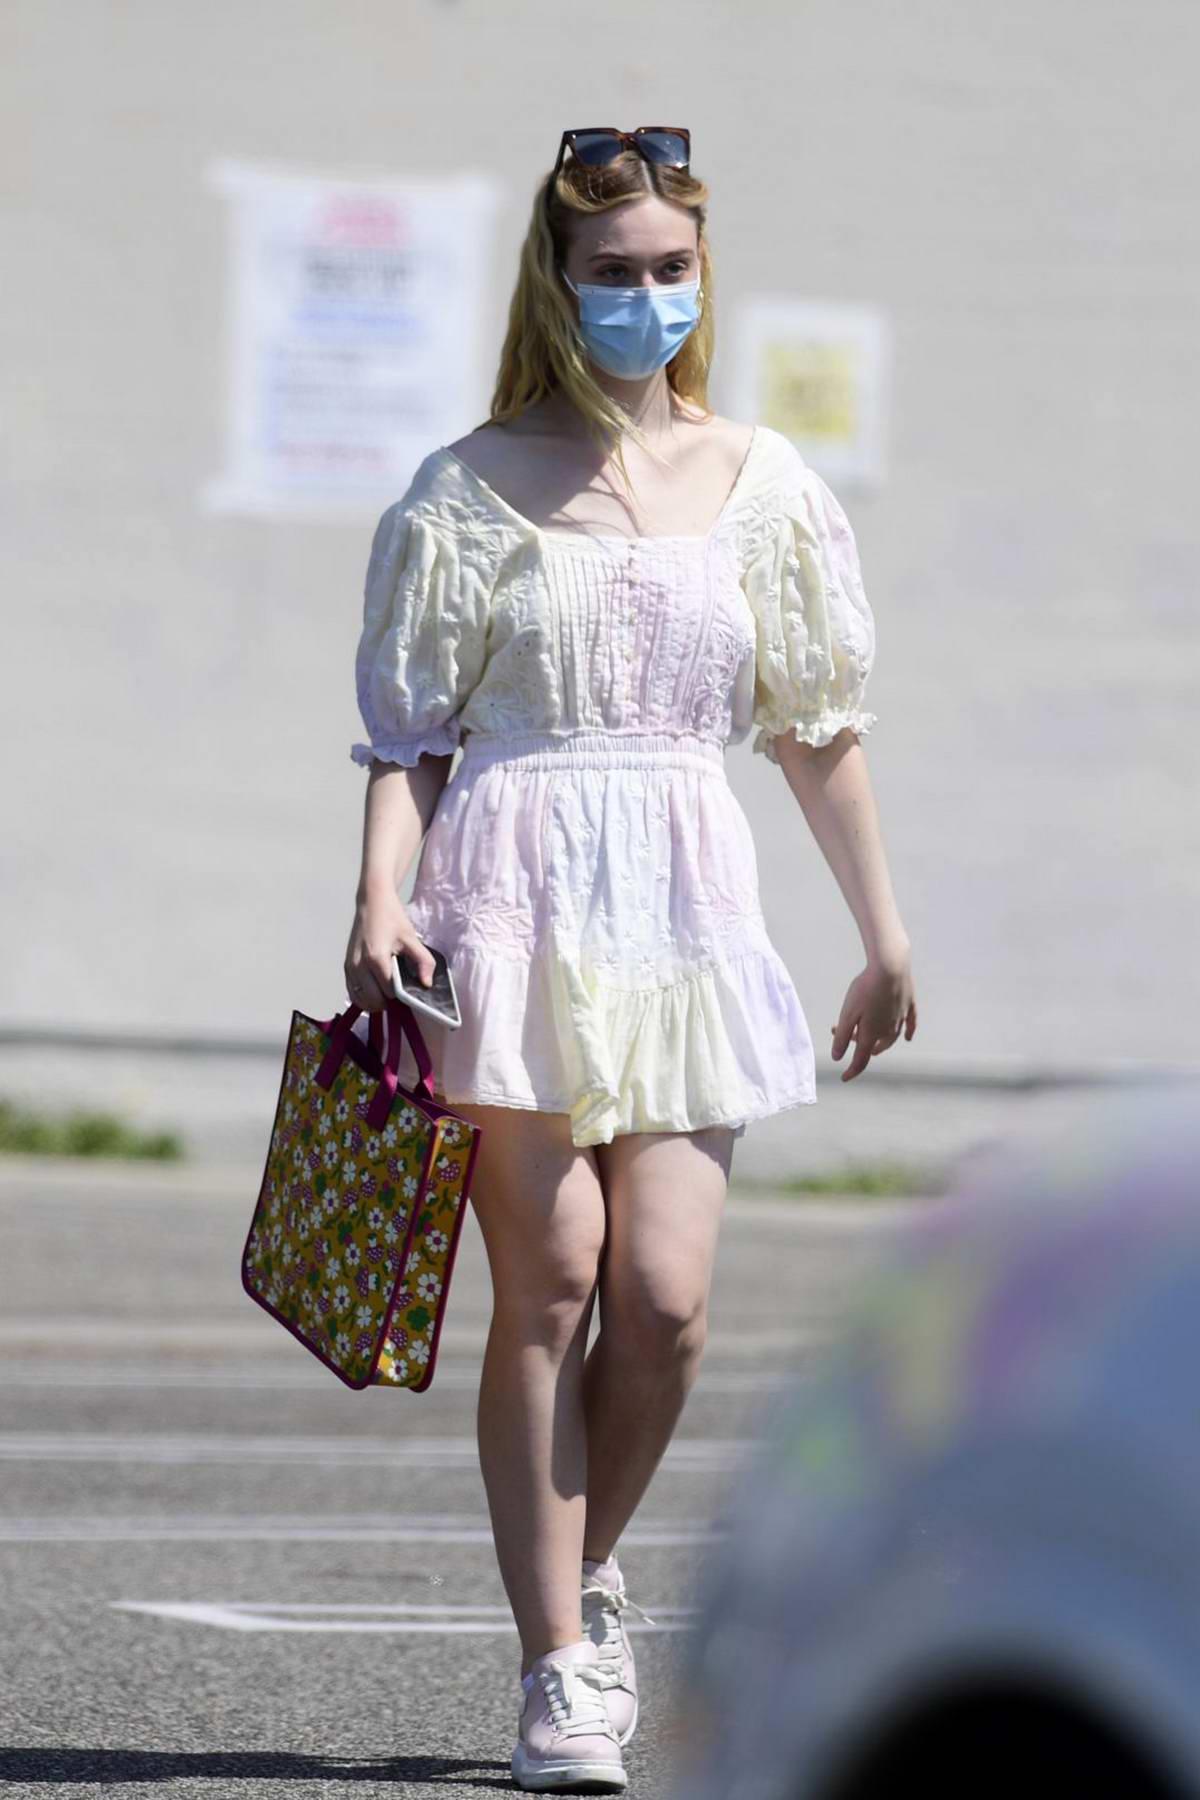 Elle Fanning looks pretty in a cute tie-dye dress during a shopping trip in Los Angeles